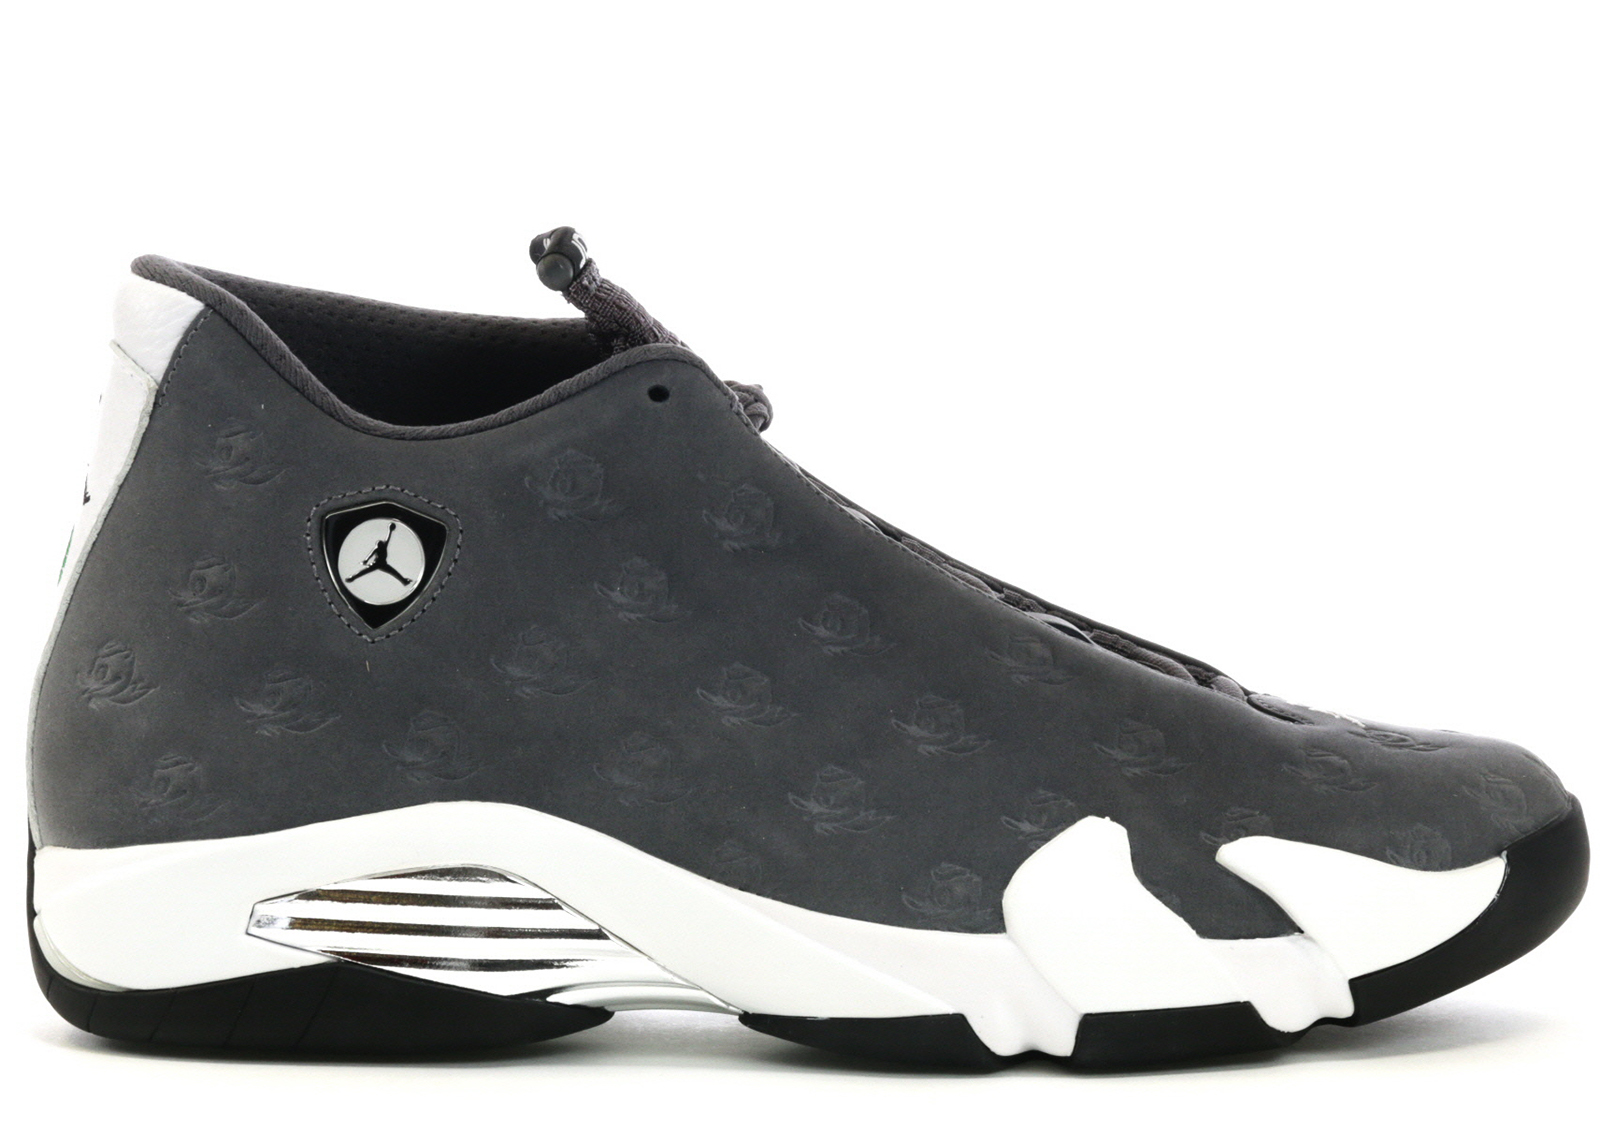 2b4fe1aedb8b ... italy air jordan shoes average sale price 9a2b3 47d40